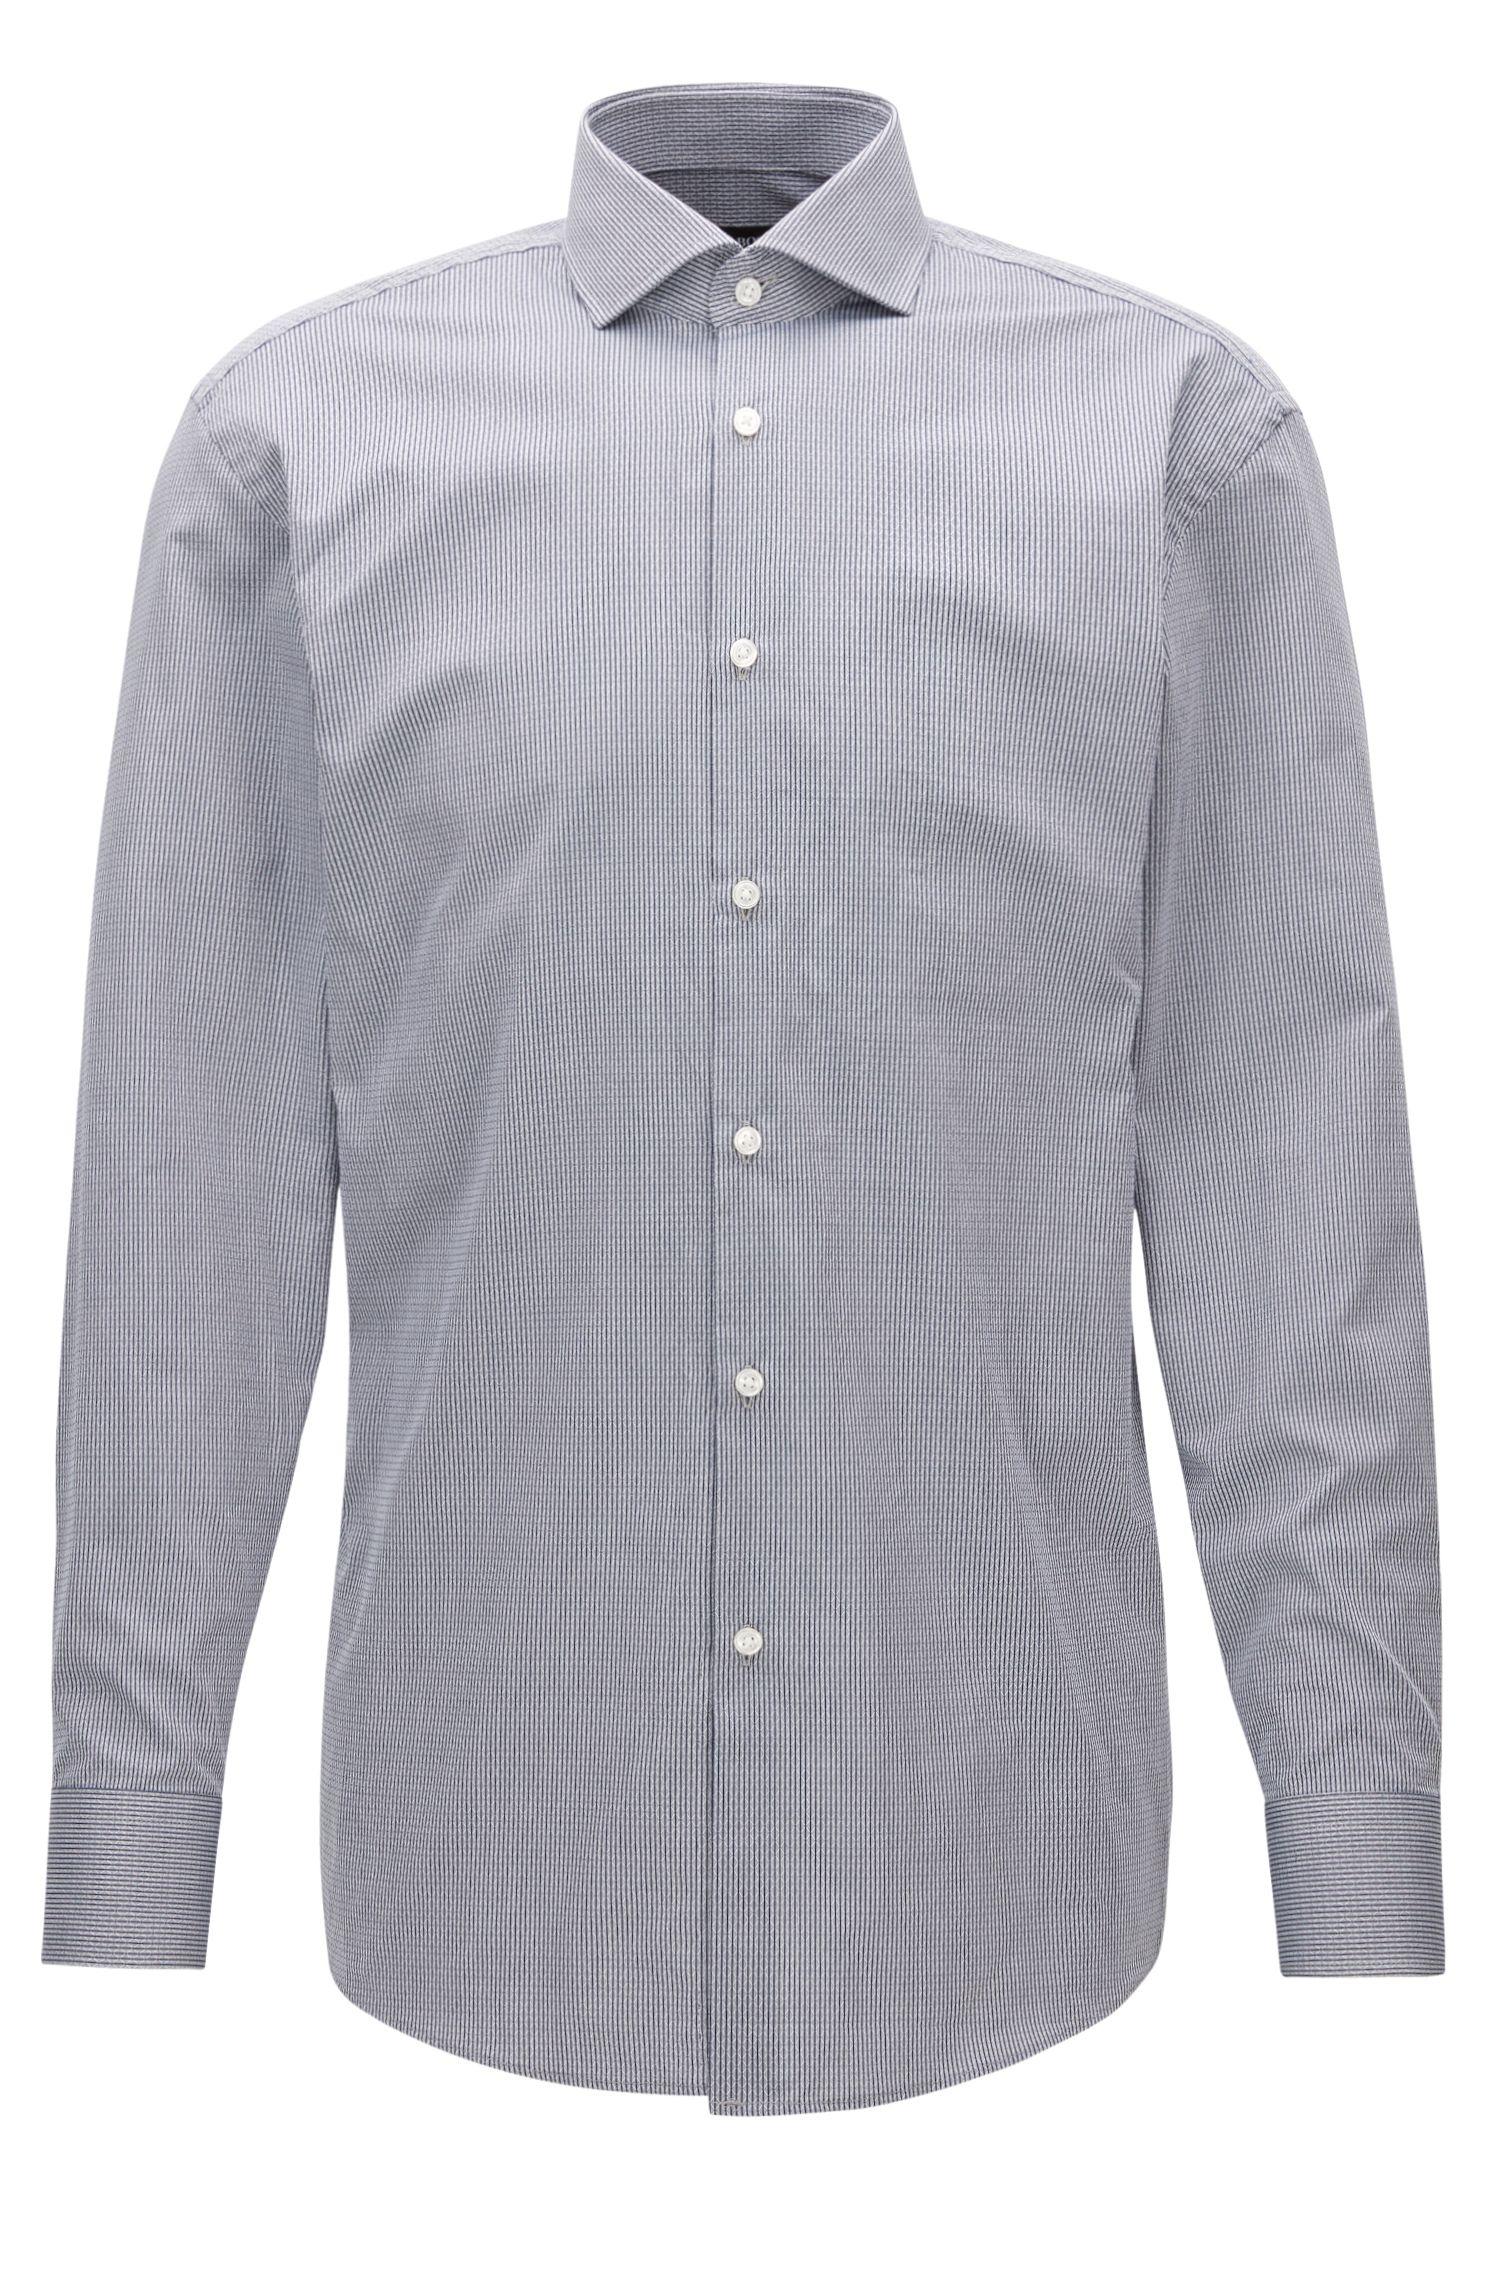 Pinstripe Patterned Cotton Dress Shirt, Sharp Fit | Mark US